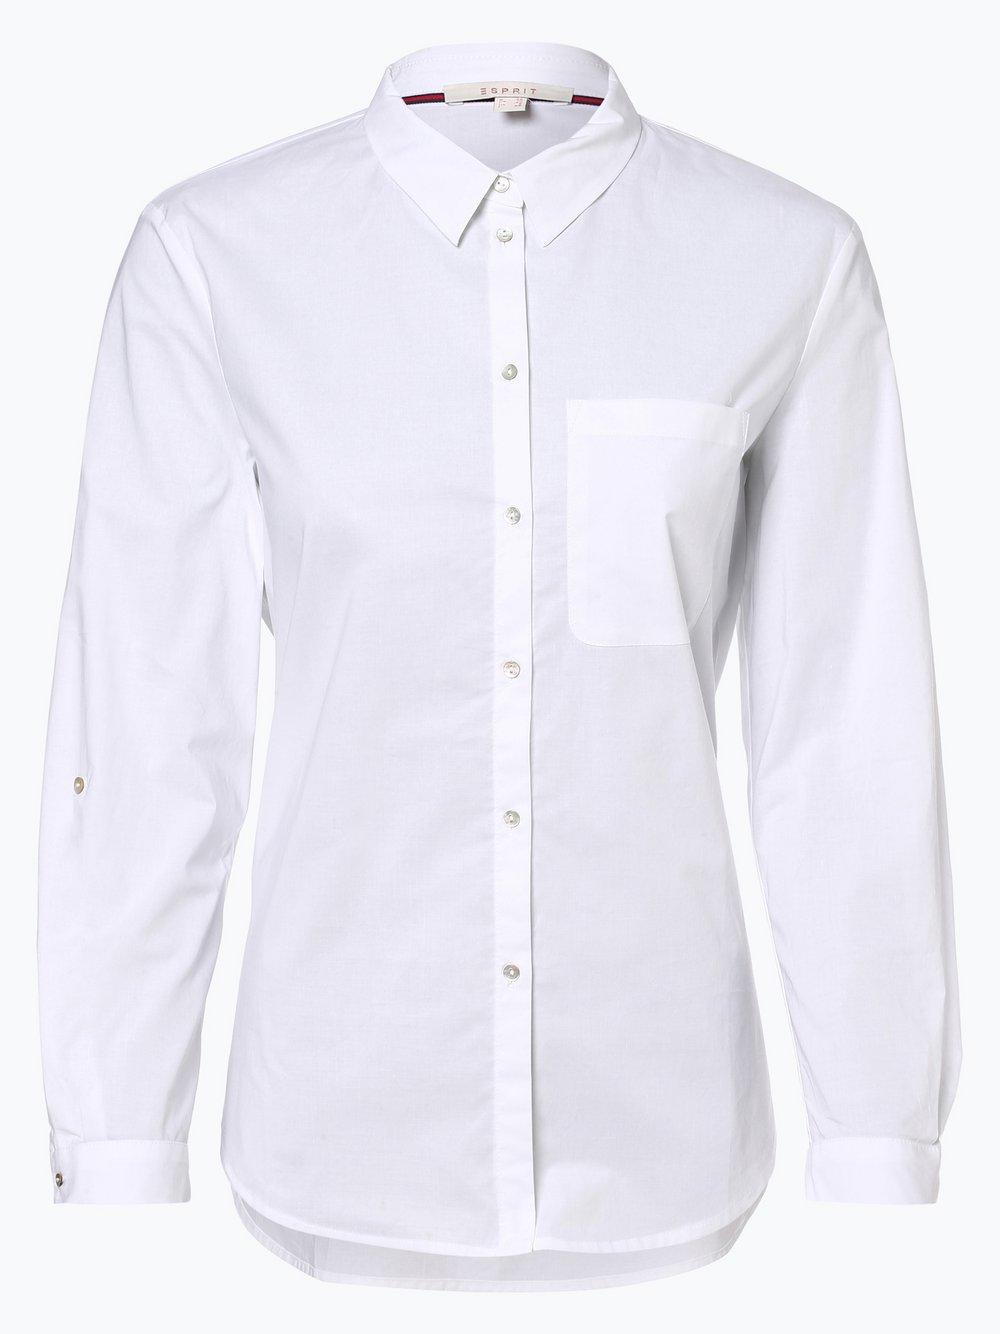 Esprit Casual - Bluzka damska, biały